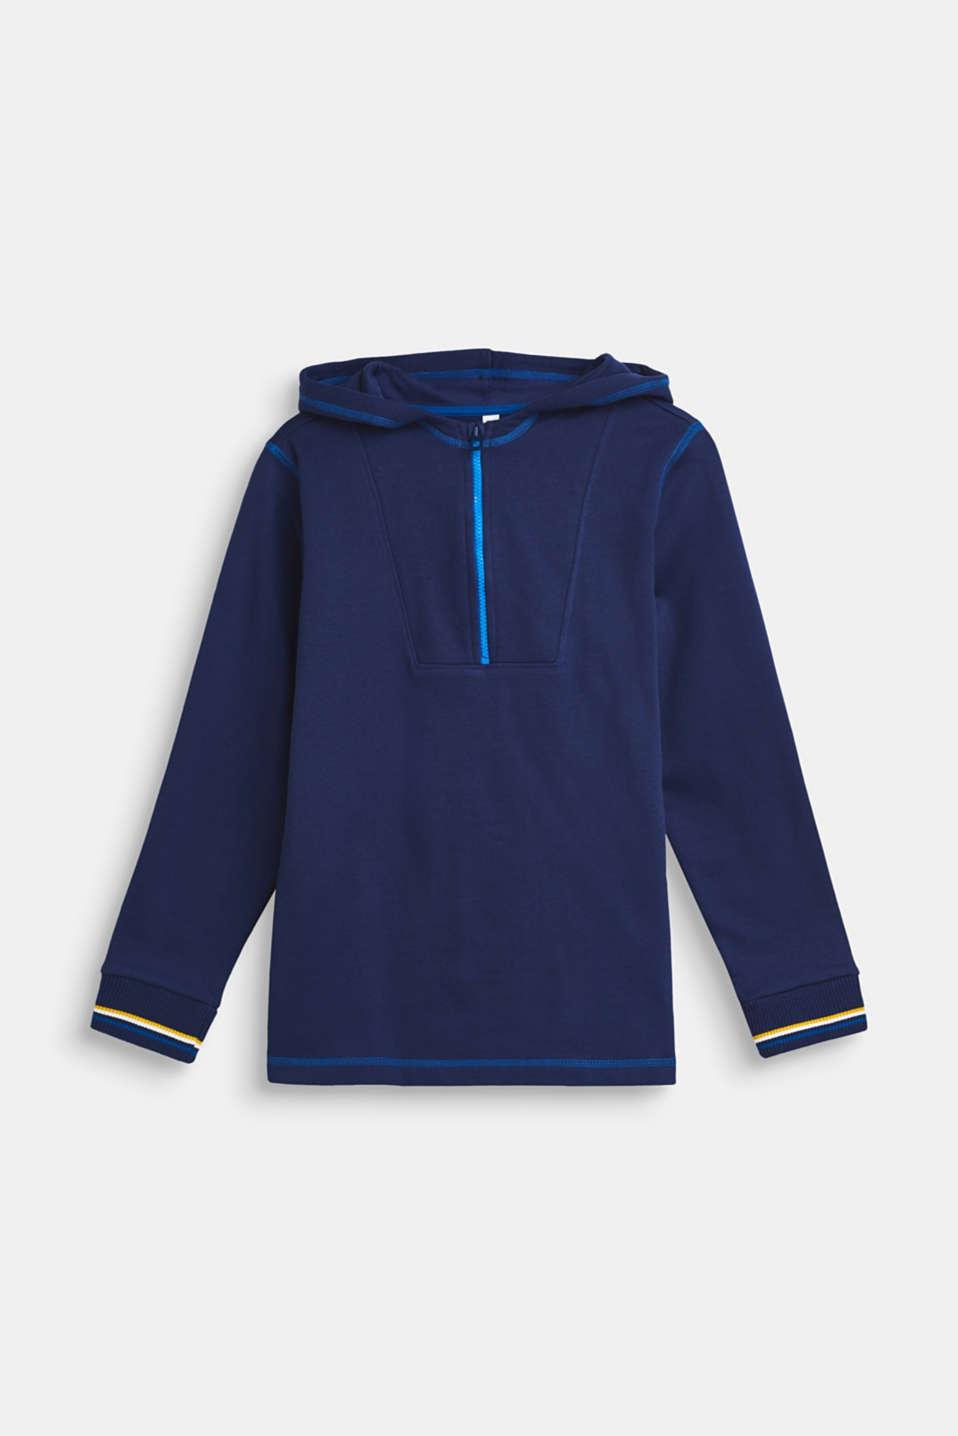 Sweatshirt hoodie with fleece lining, 100% cotton, LCMARINE BLUE, detail image number 0